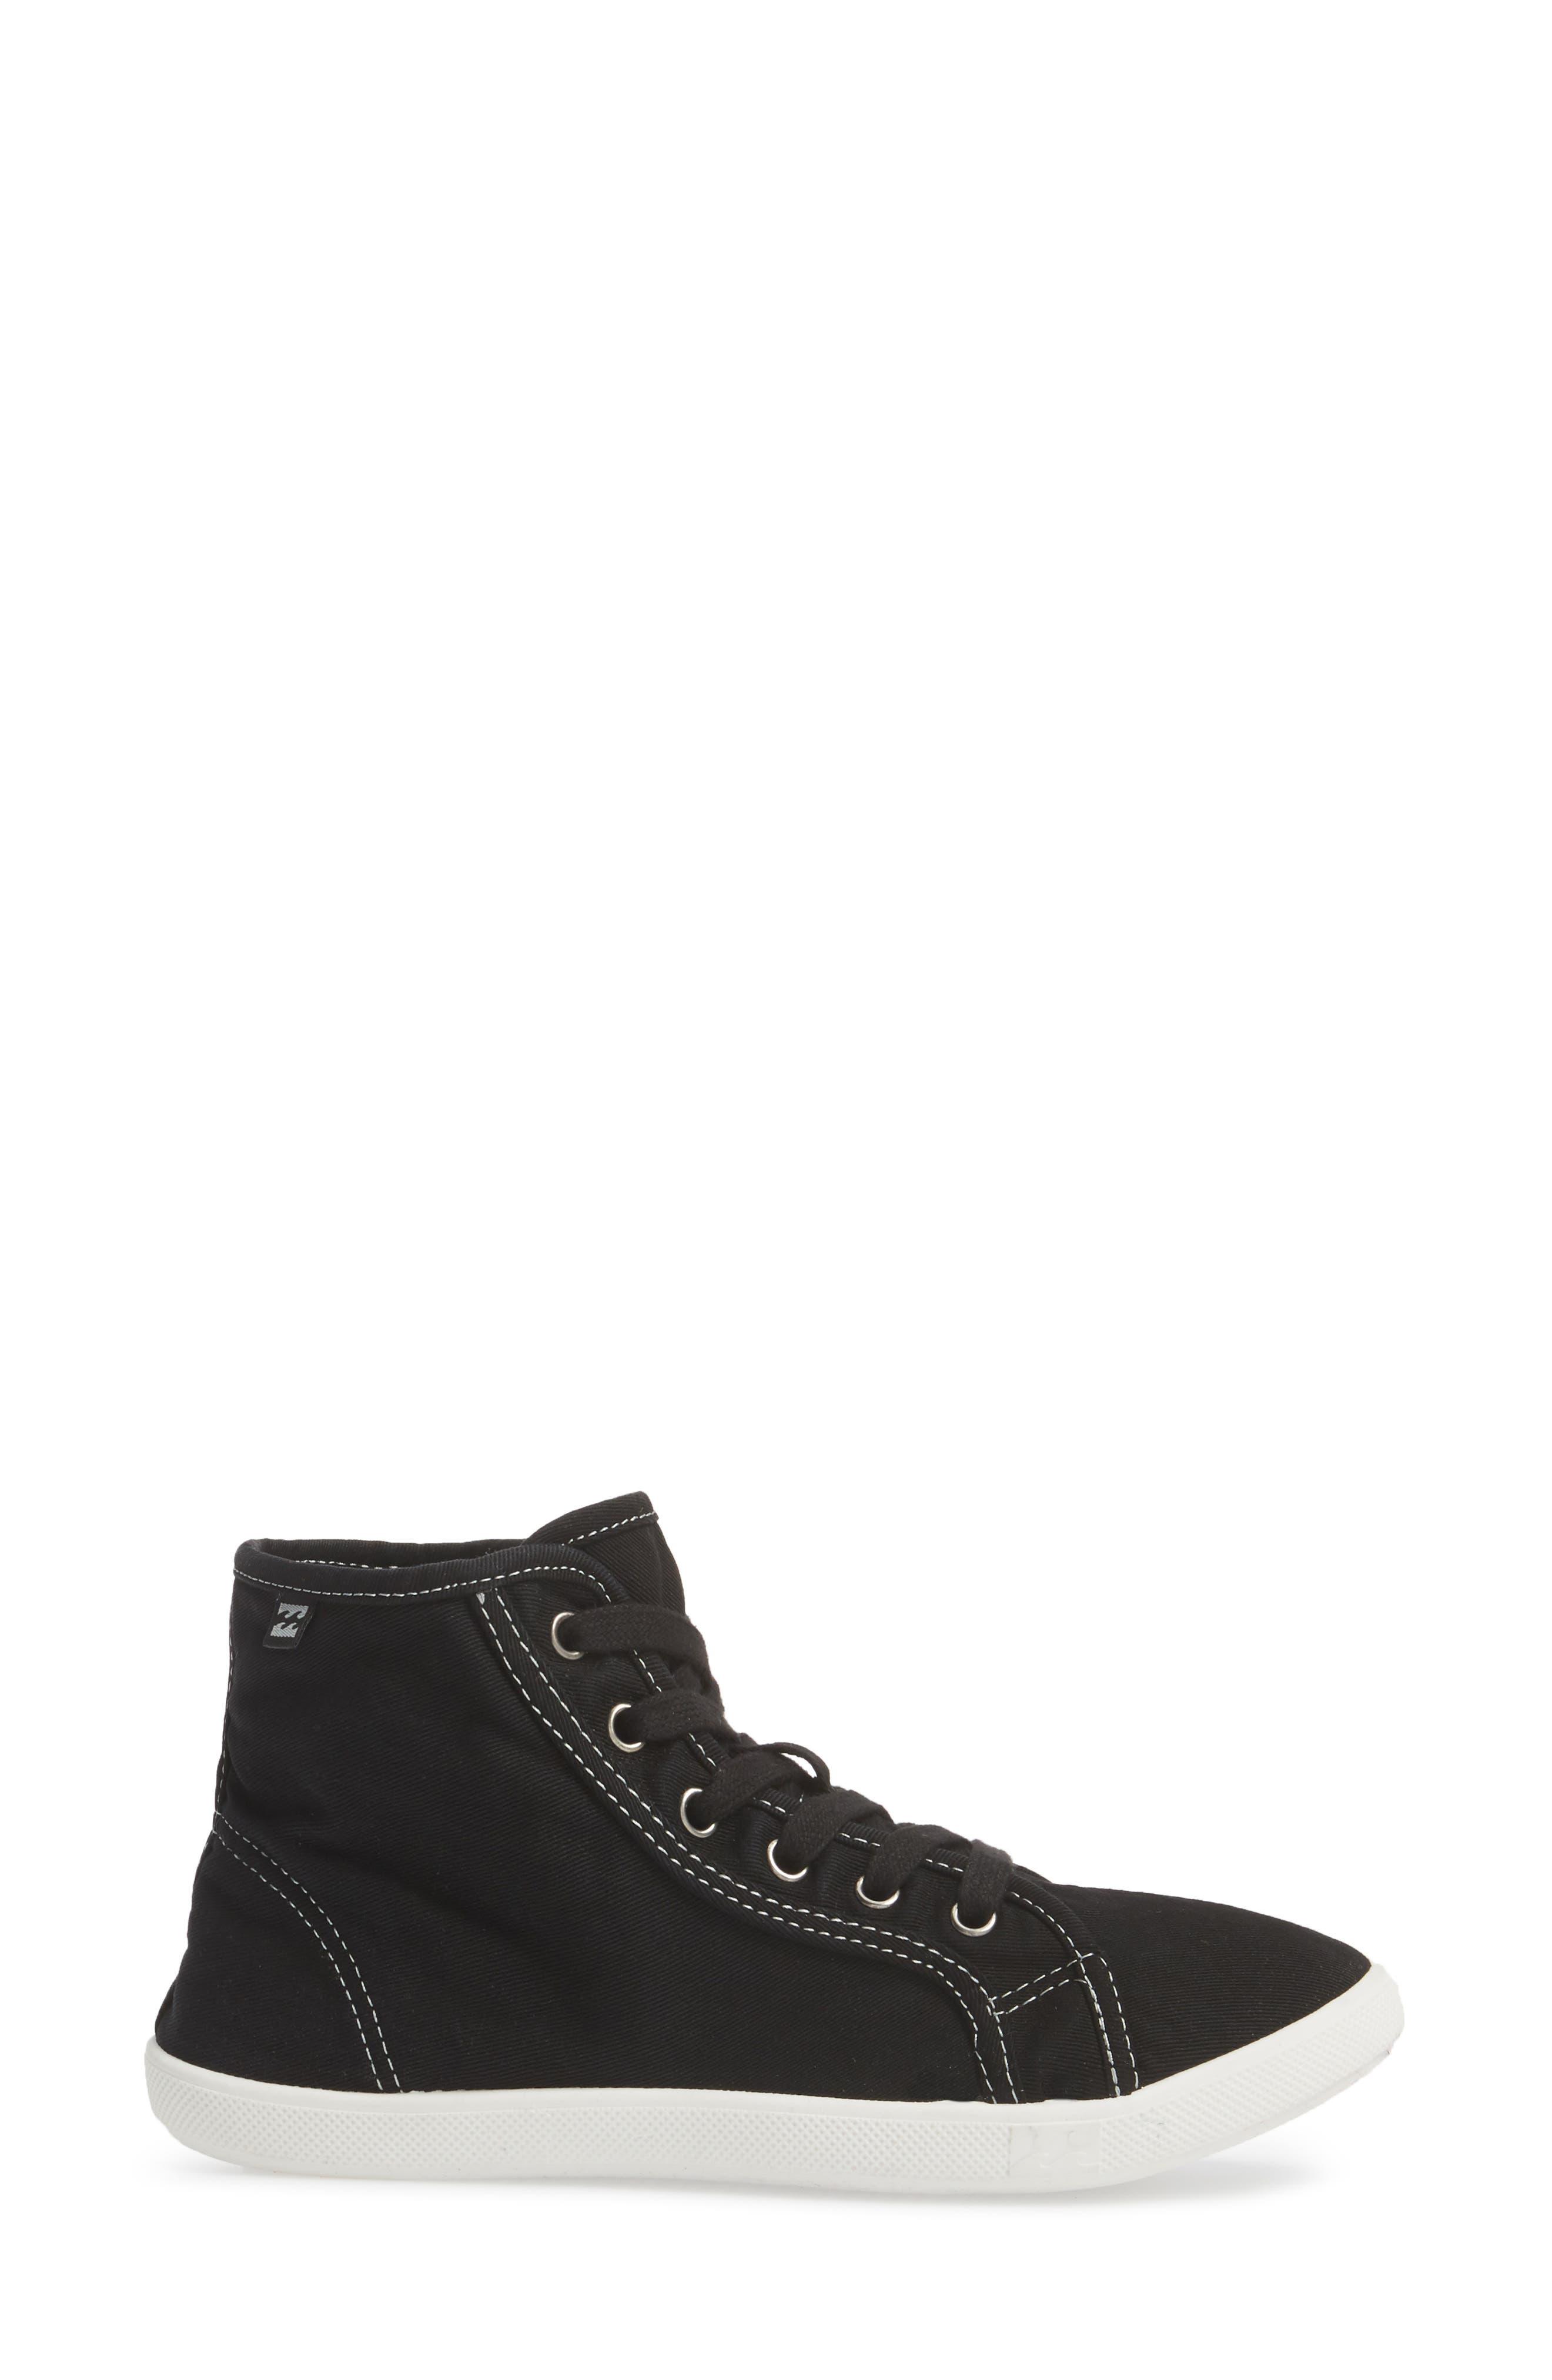 Phoenix Sneaker,                             Alternate thumbnail 6, color,